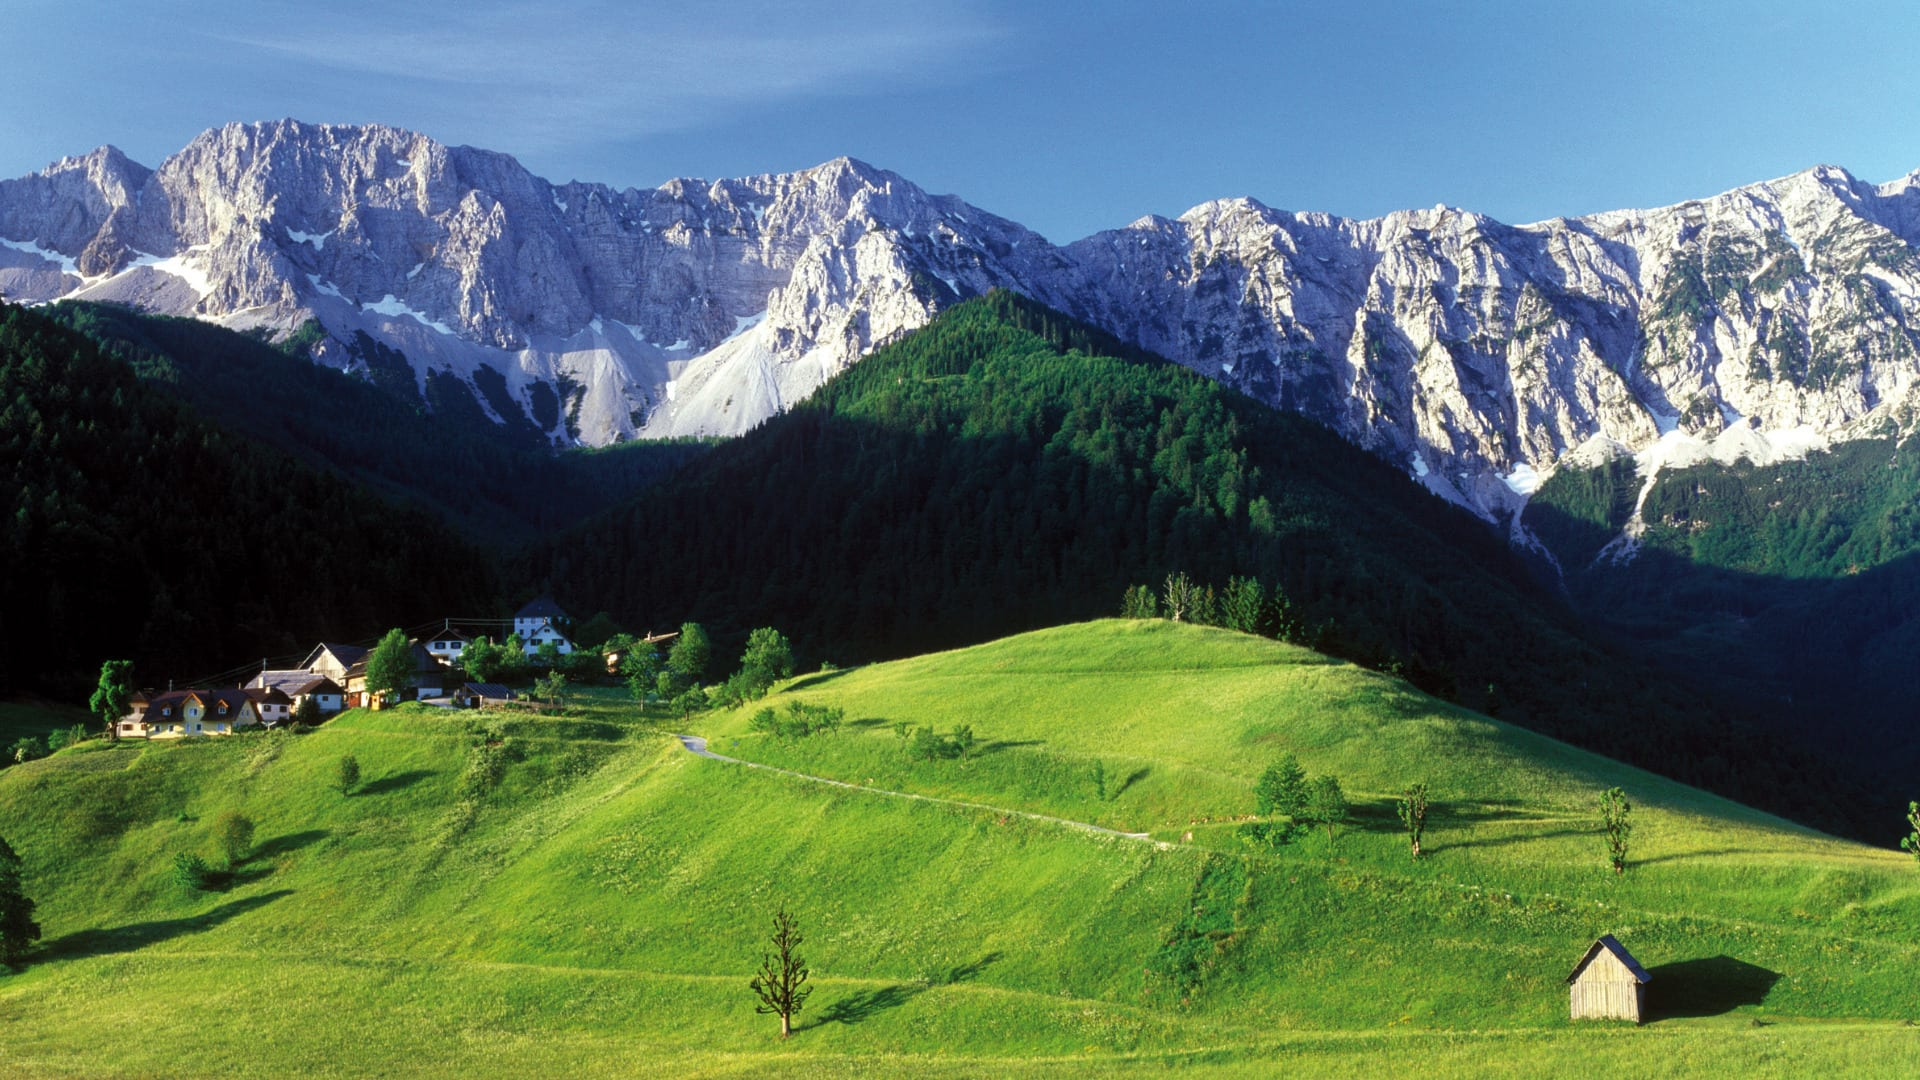 Wanderurlaub-Karawanken-Koschuta-Suedkaernten